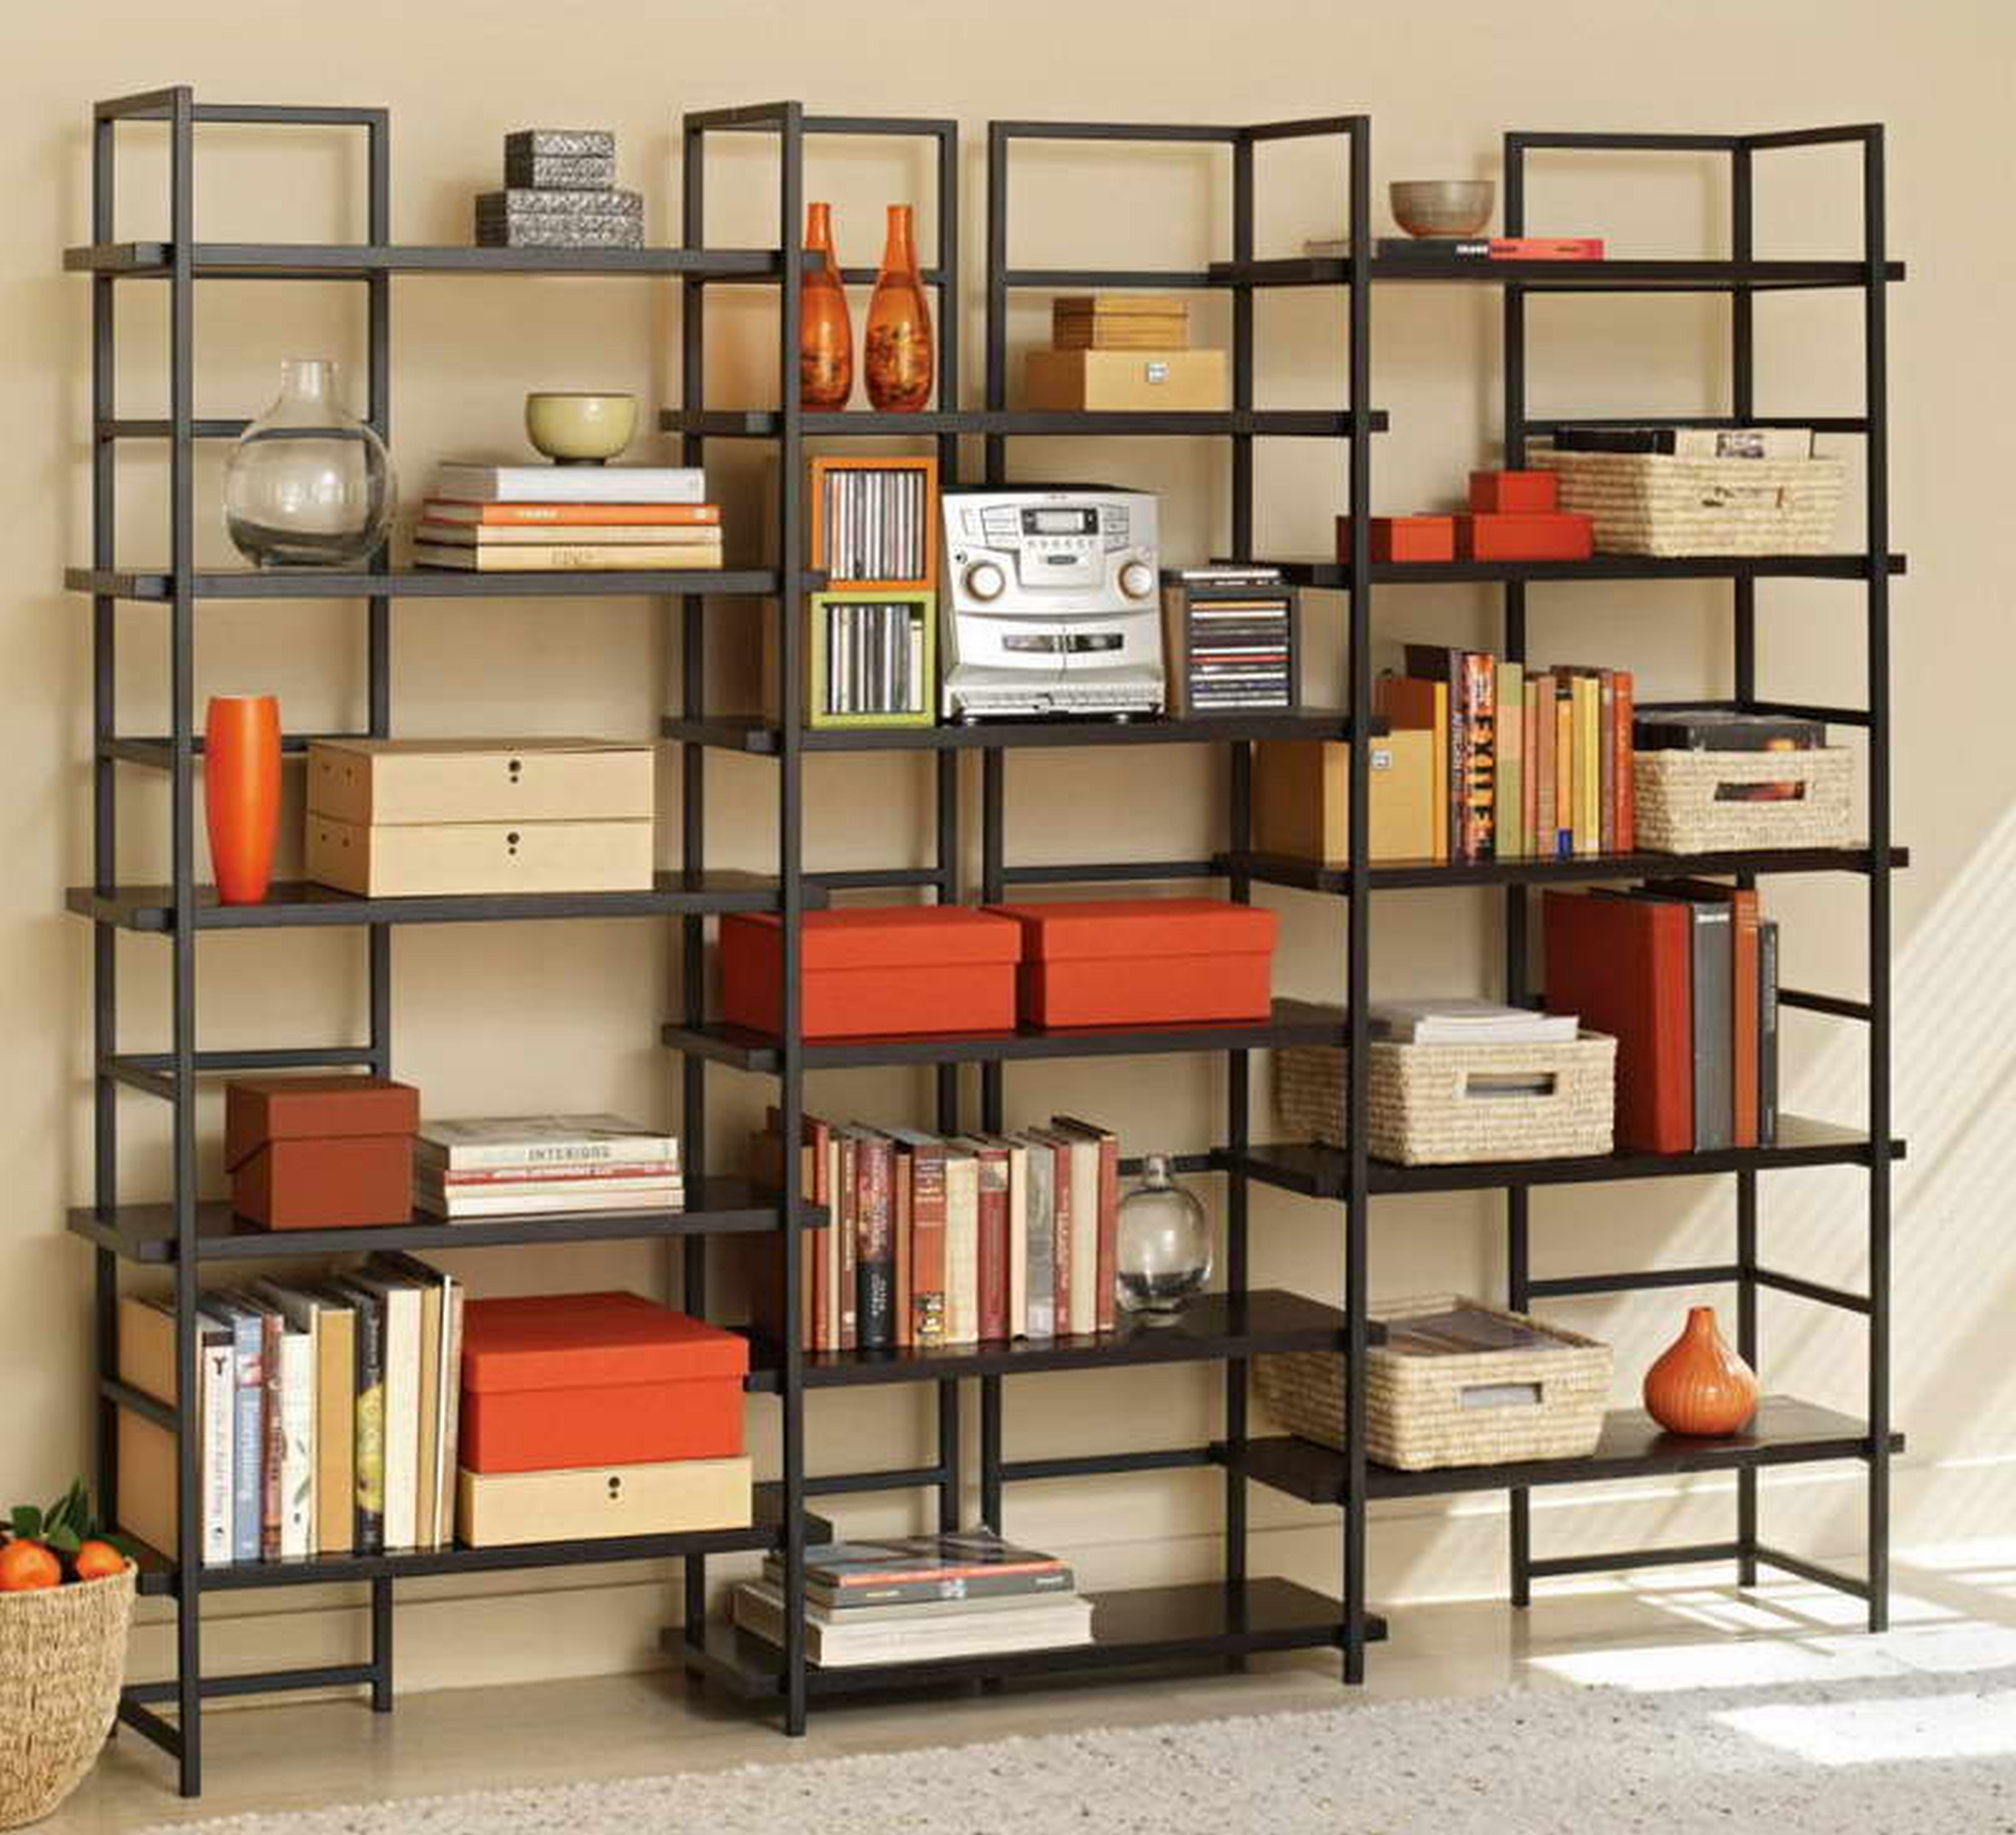 Most Popular Bookshelf (View 13 of 15)